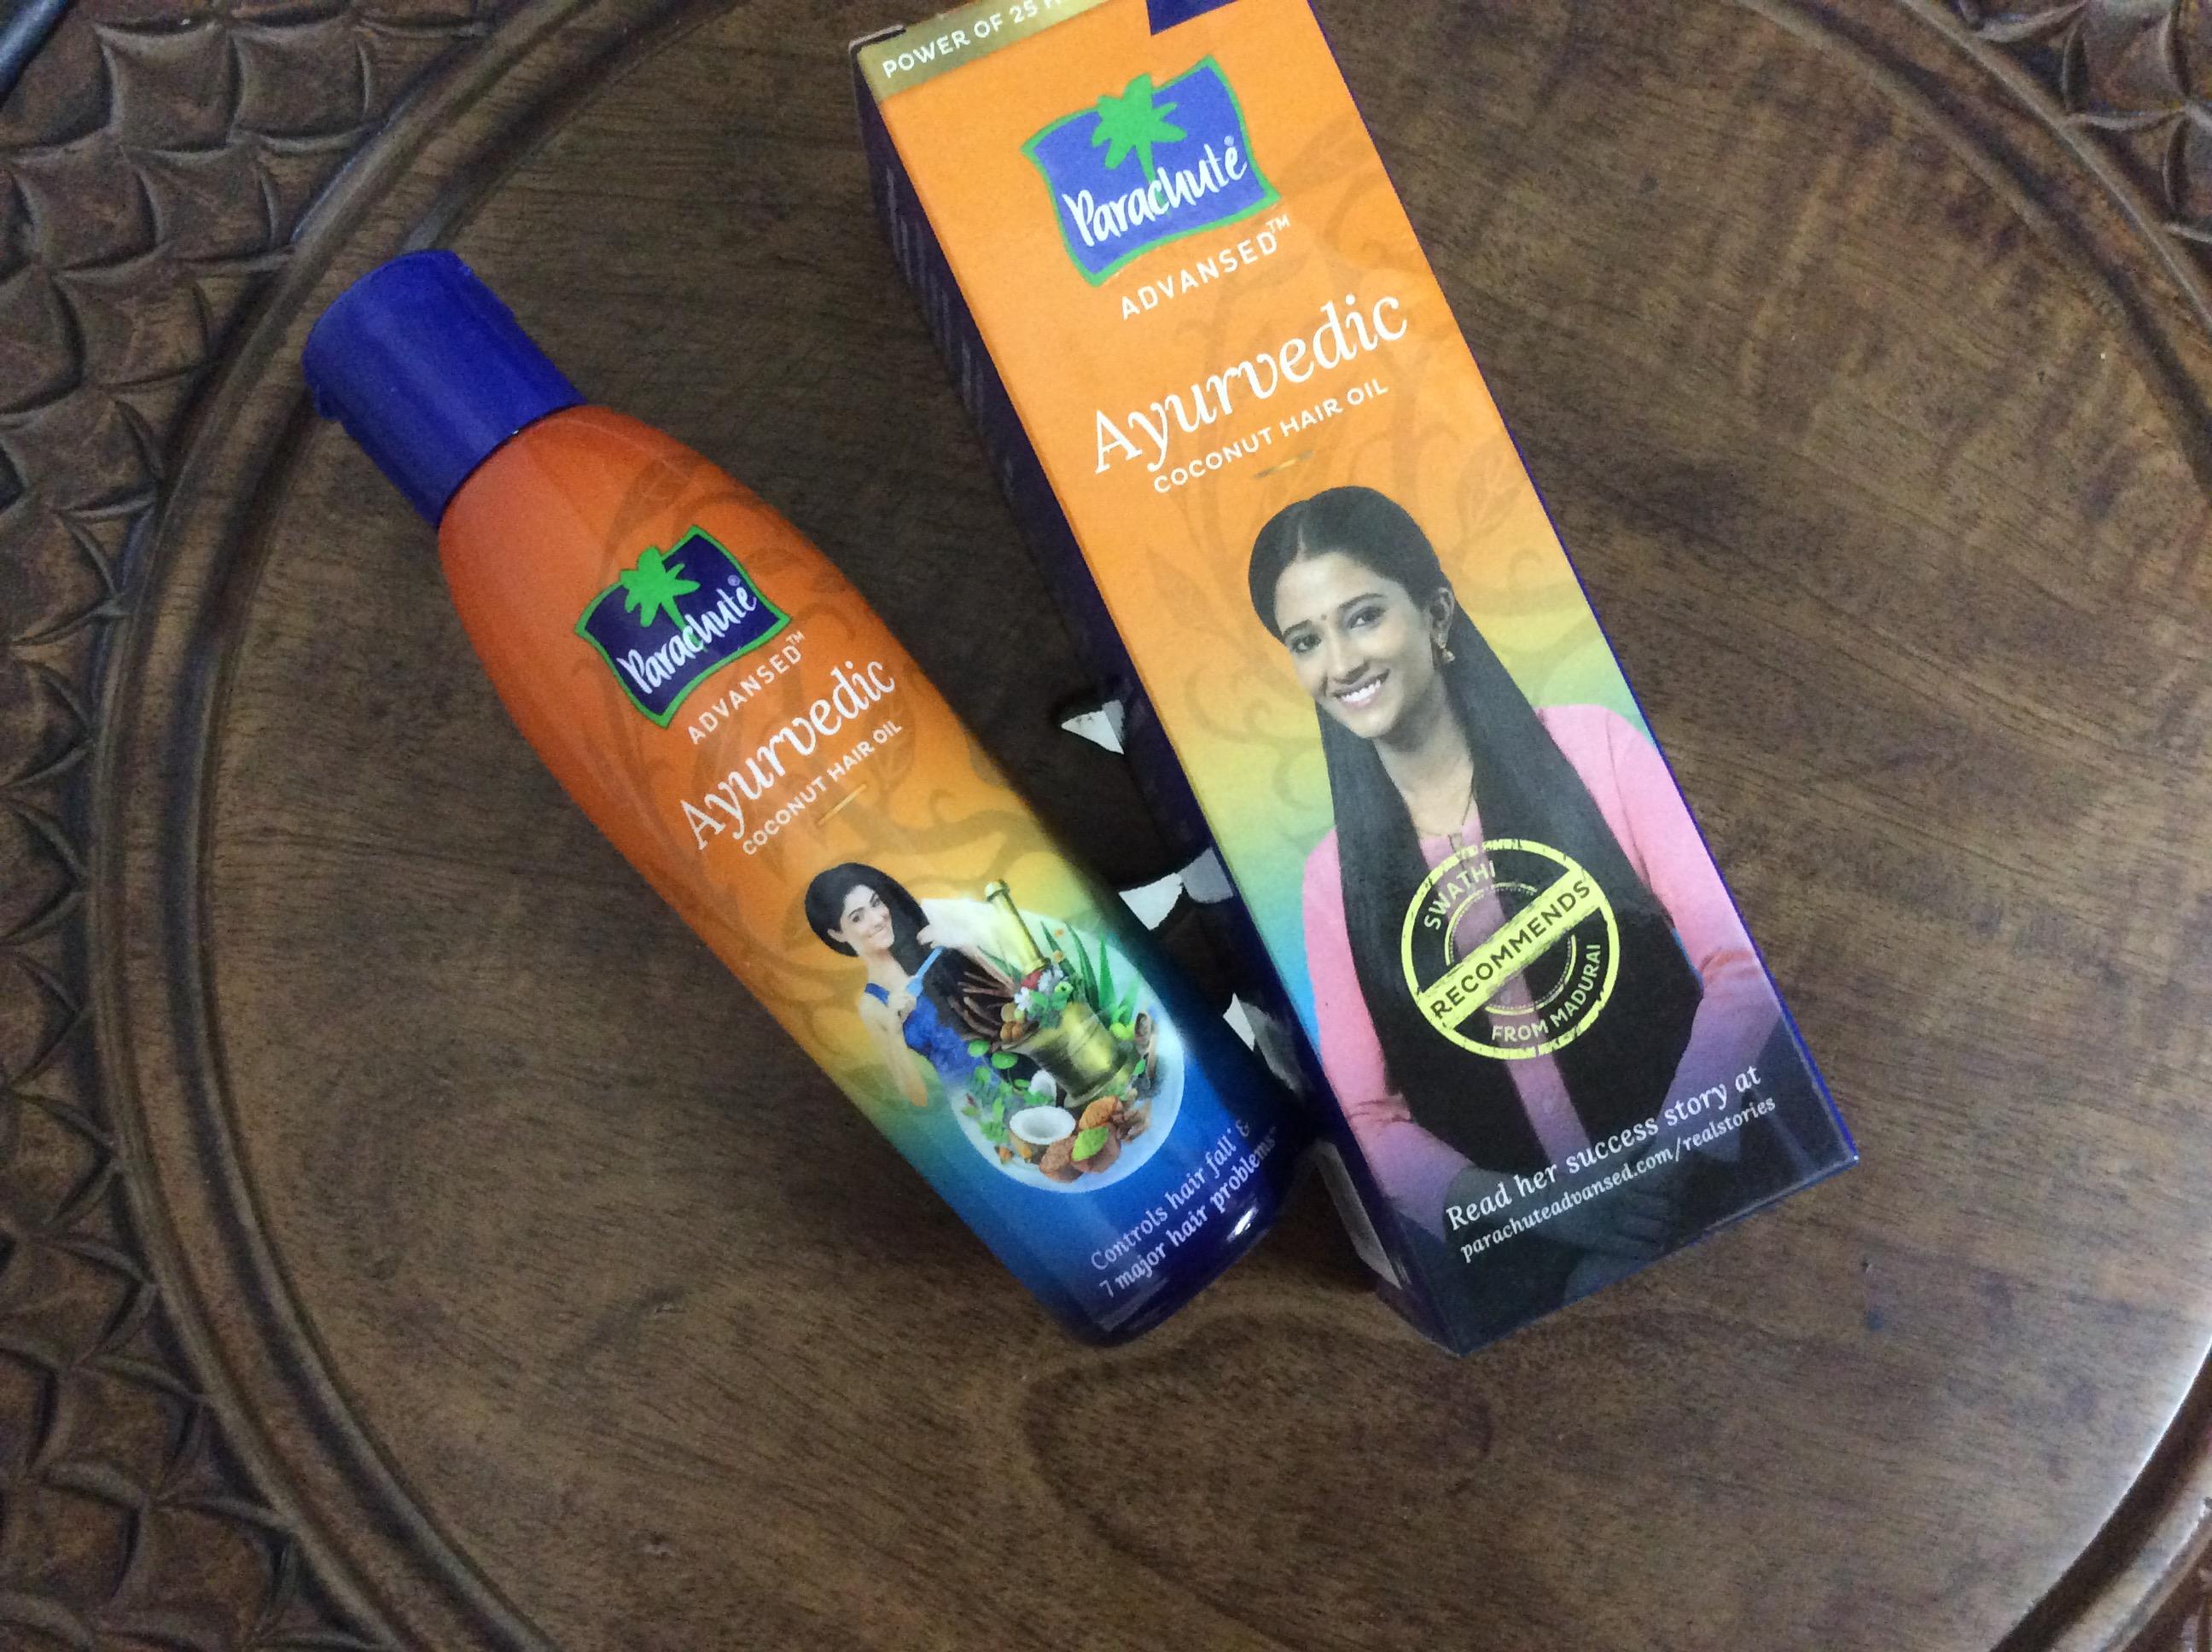 Parachute Advansed Ayurvedic Coconut Hair Oil -Very light and smells pleasant-By divya_khera